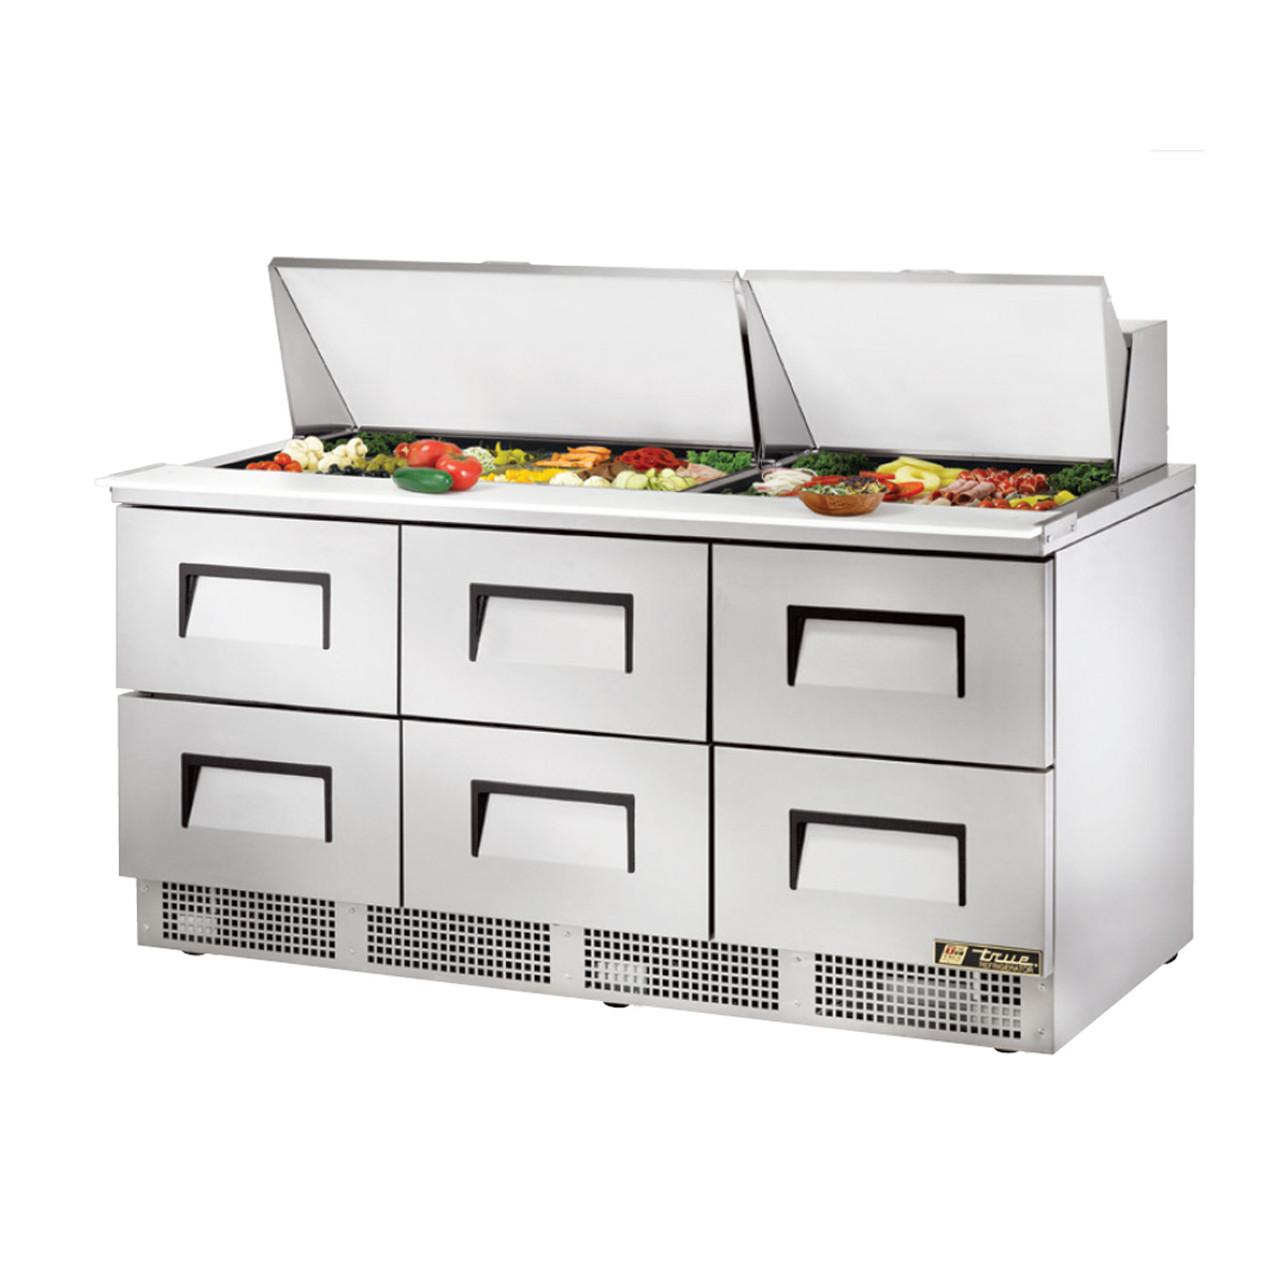 "True TFP-12-12M-D-12 - 12"" 12 Bin 12 Drawer Sandwich/Salad Prep Table"